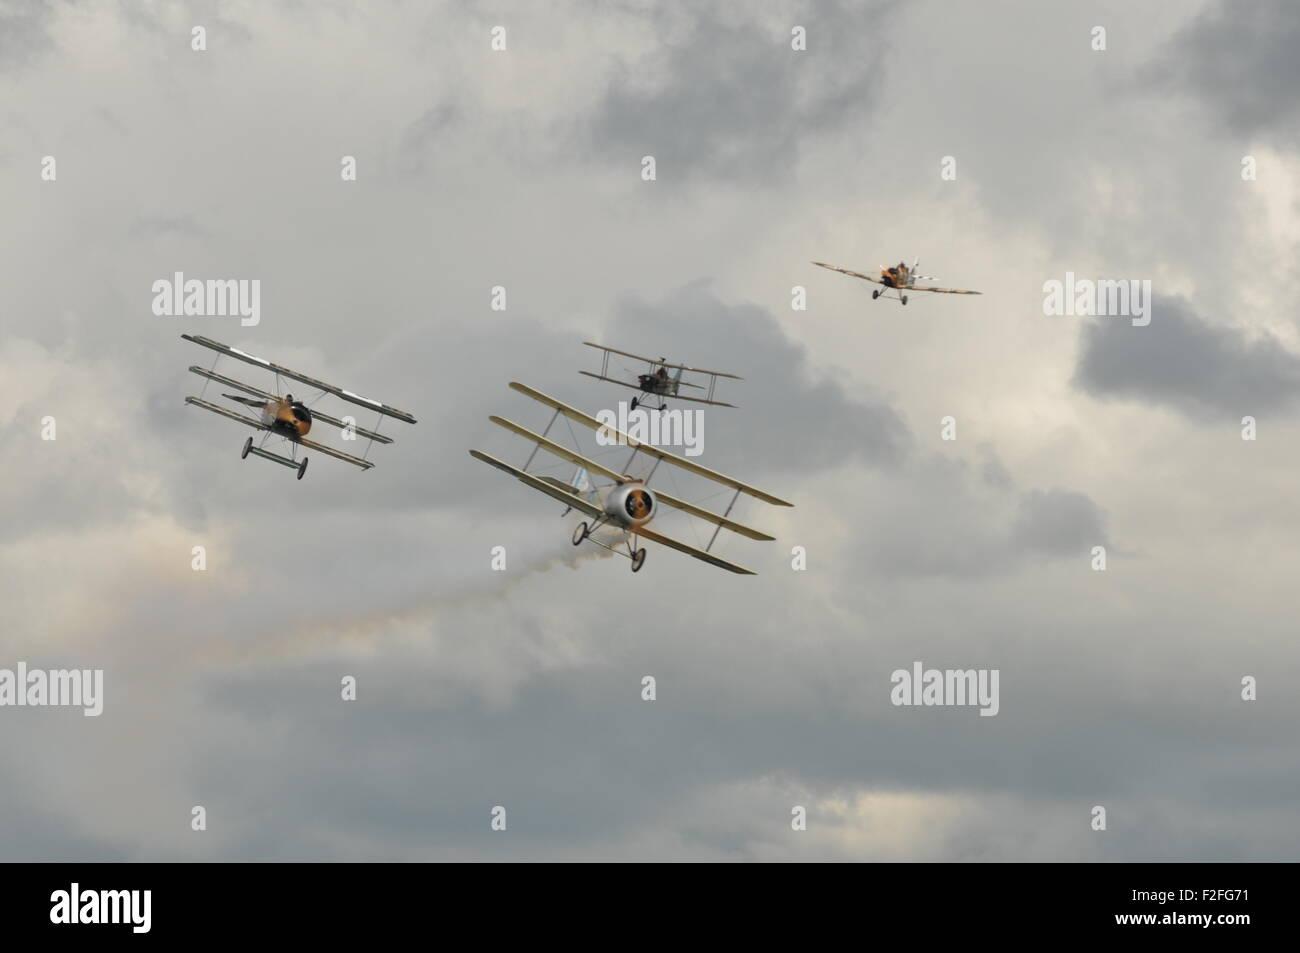 Great war display team 4 aircraft flying towards camera, 2 triplanes, 2 biplanes, 1 monoplane - Stock Image